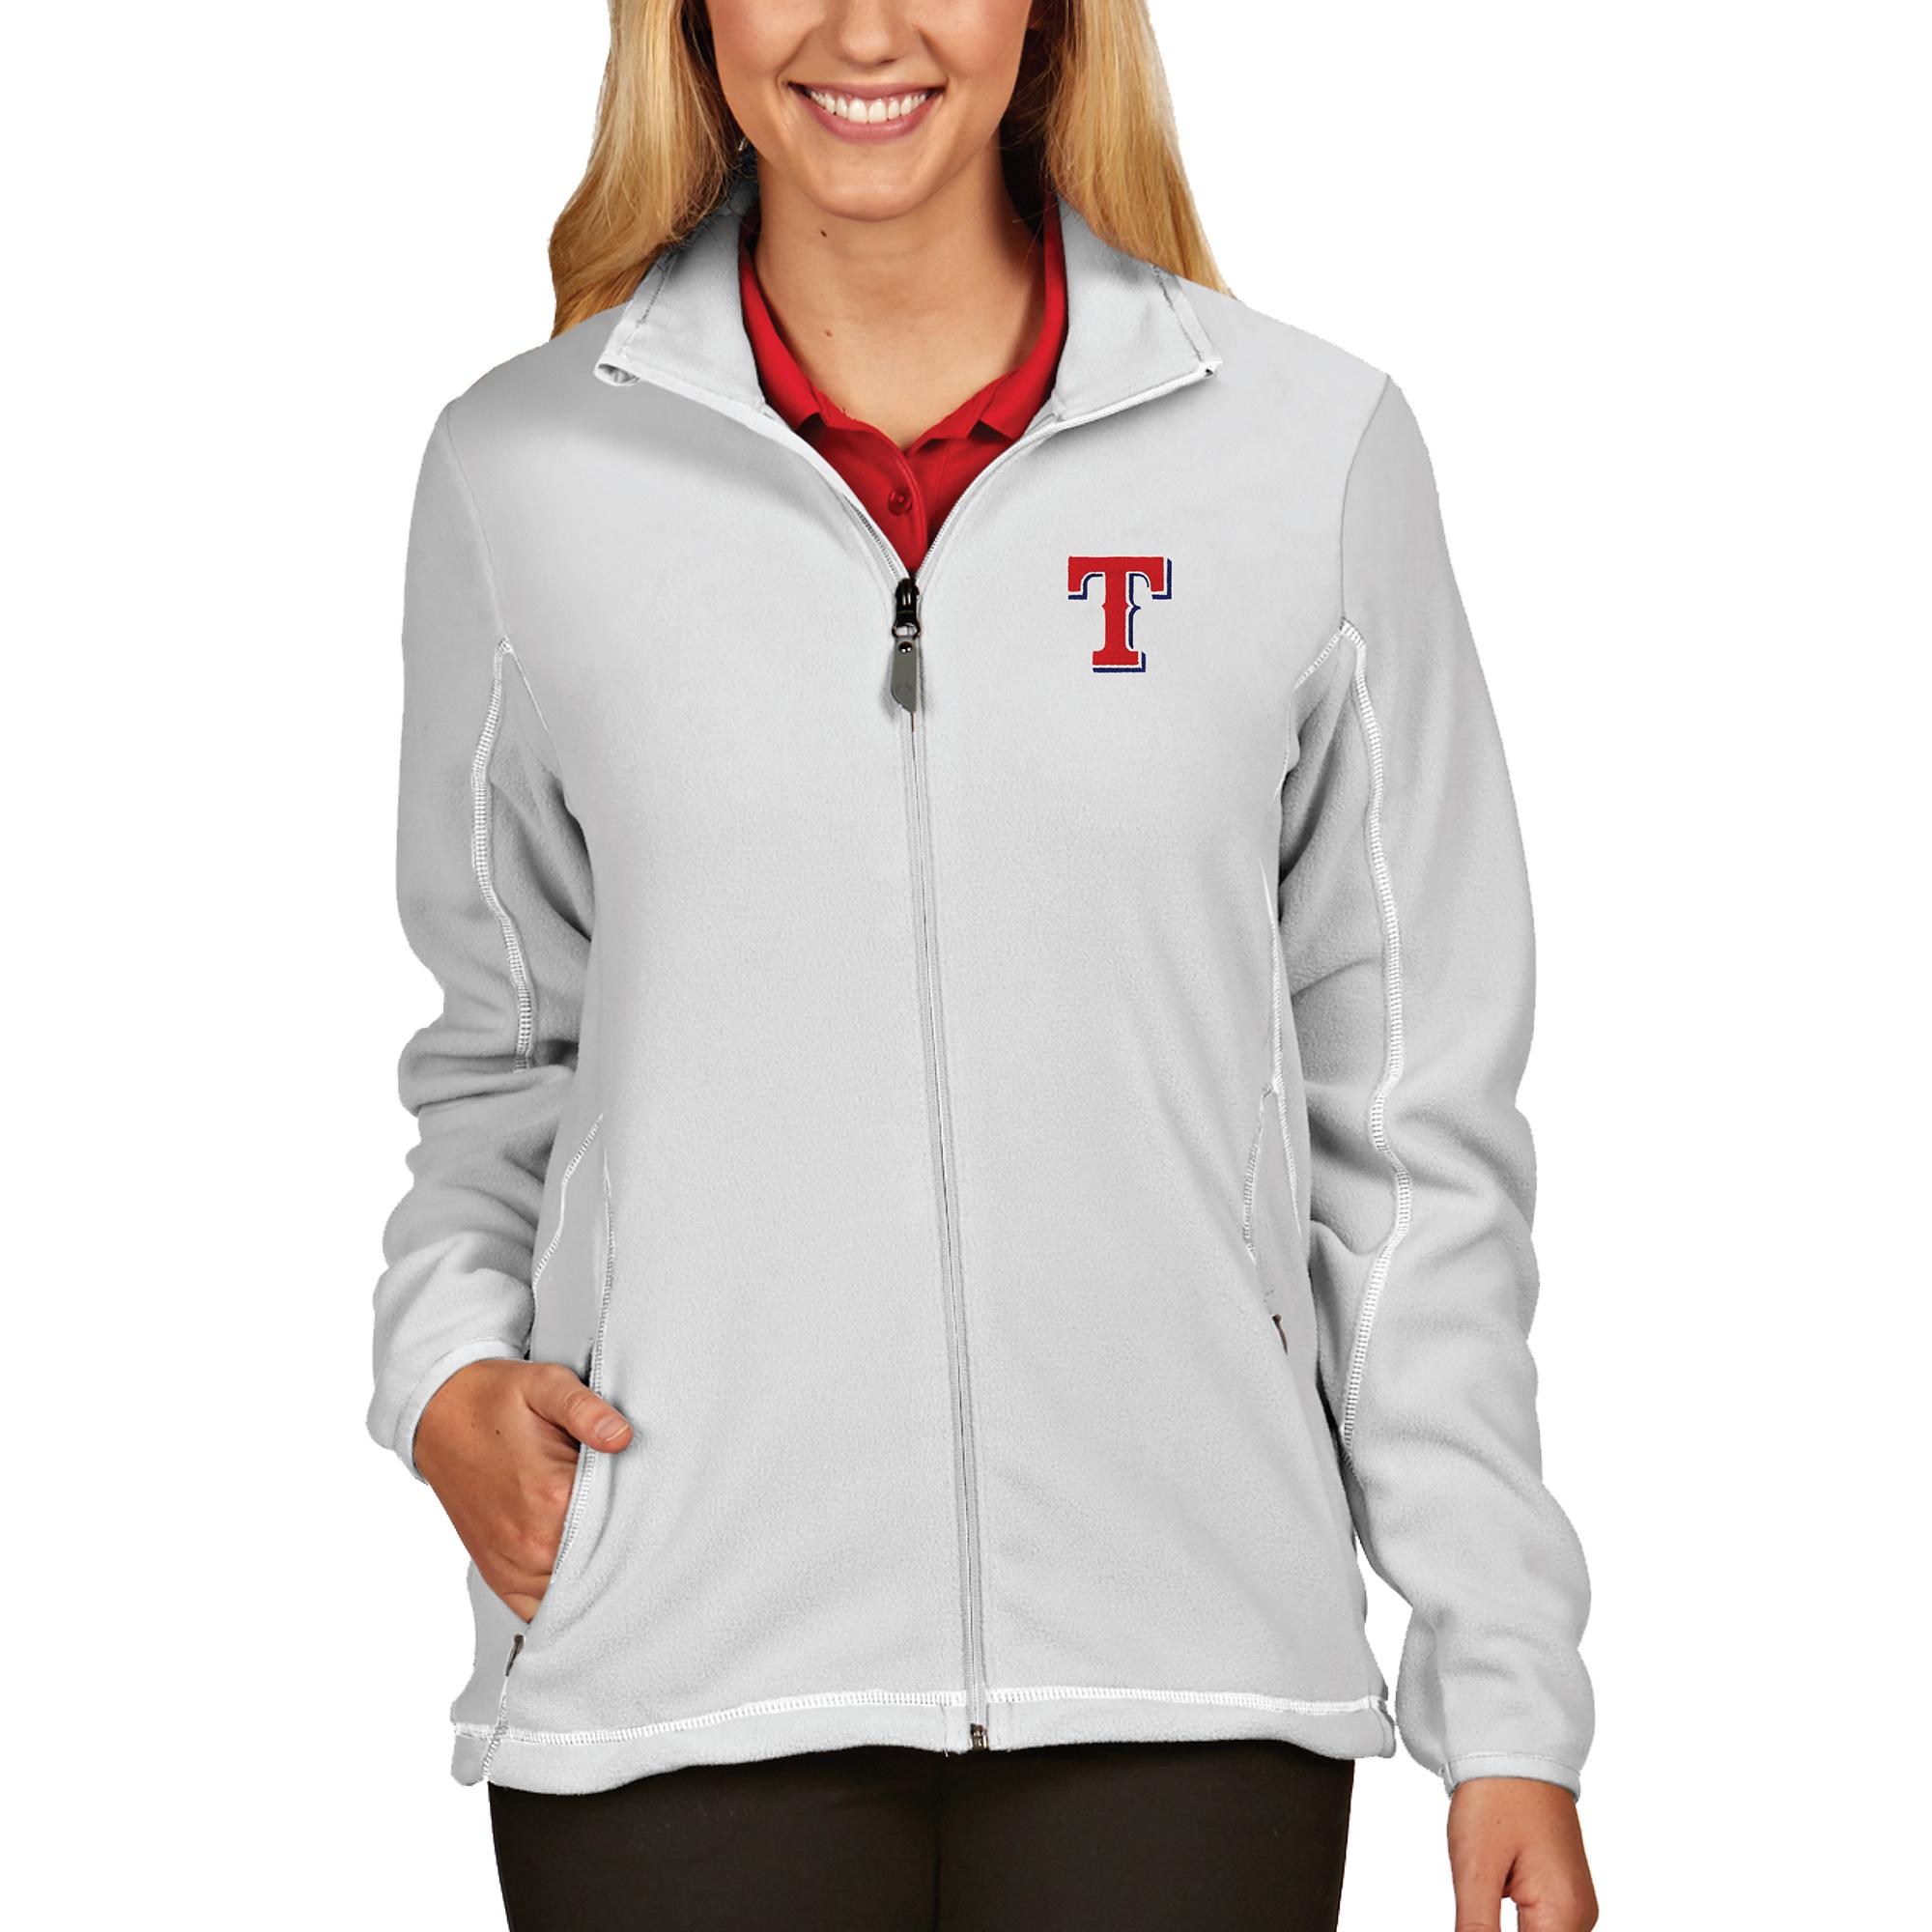 Texas Rangers Antigua Women's Full Zip Ice Jacket - White